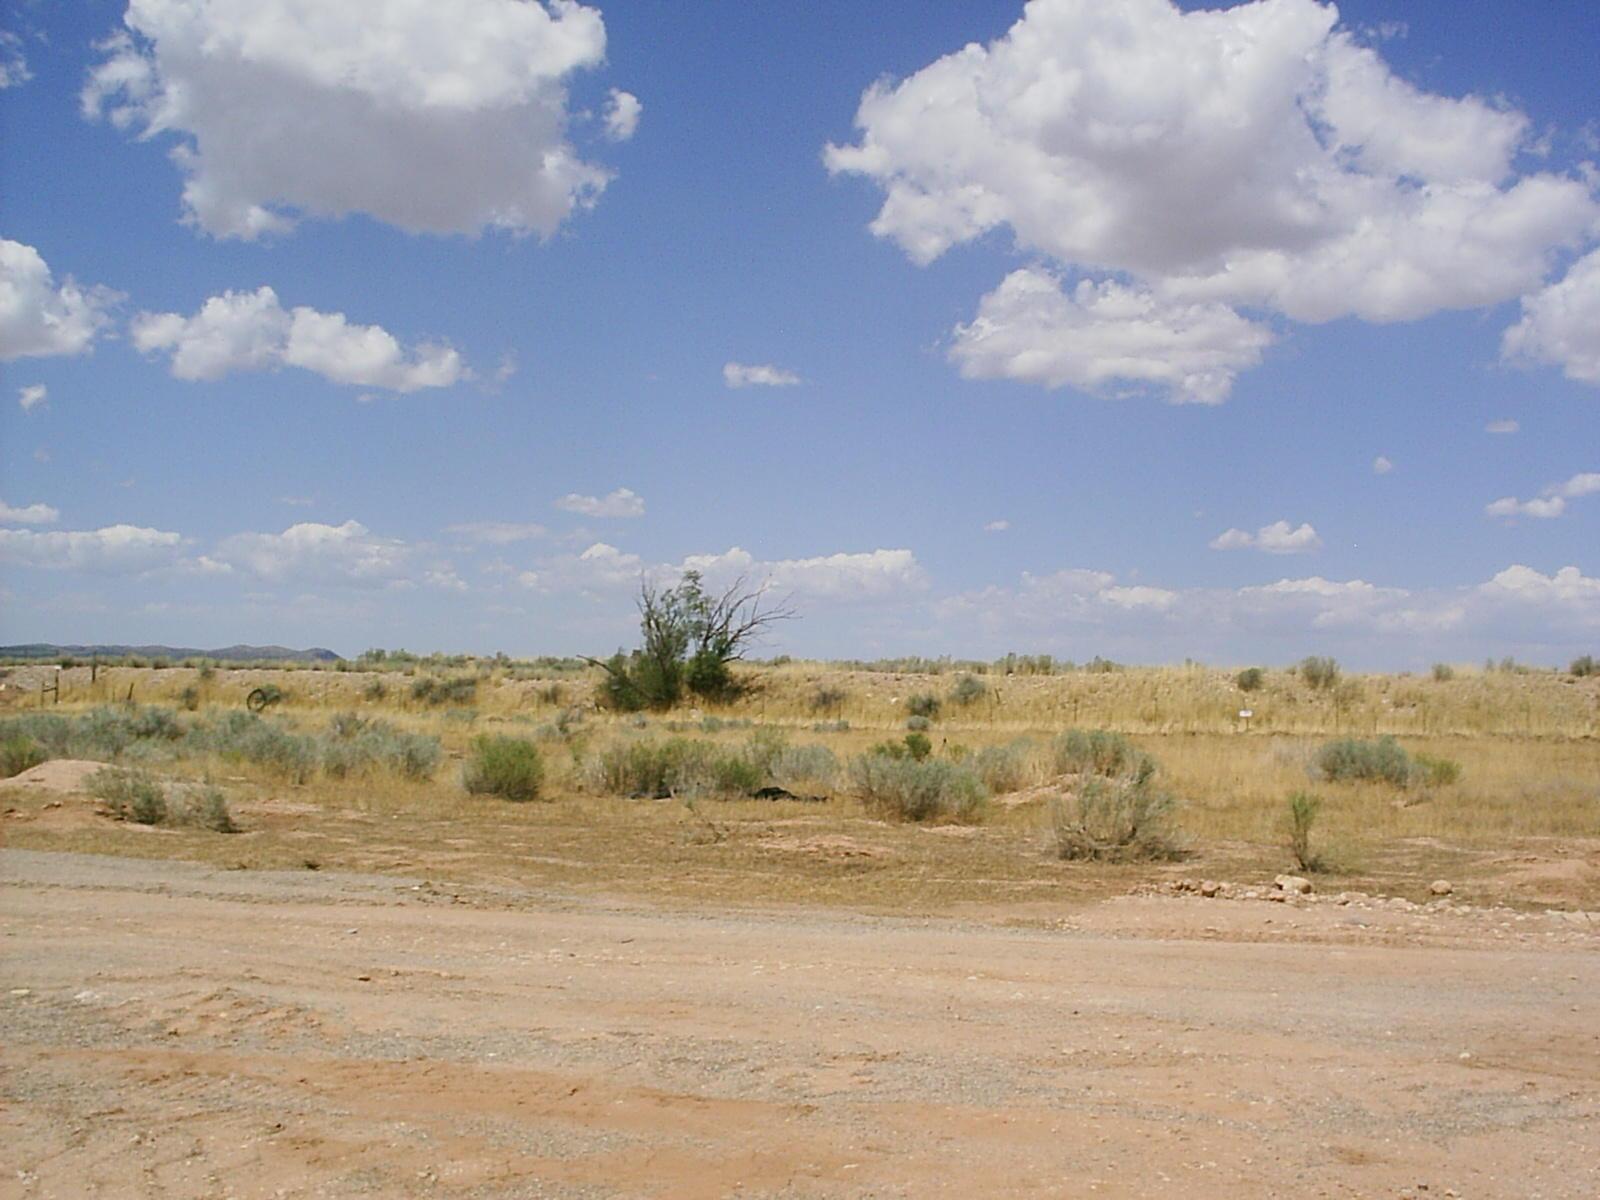 850 North (3.54 Acres) 7